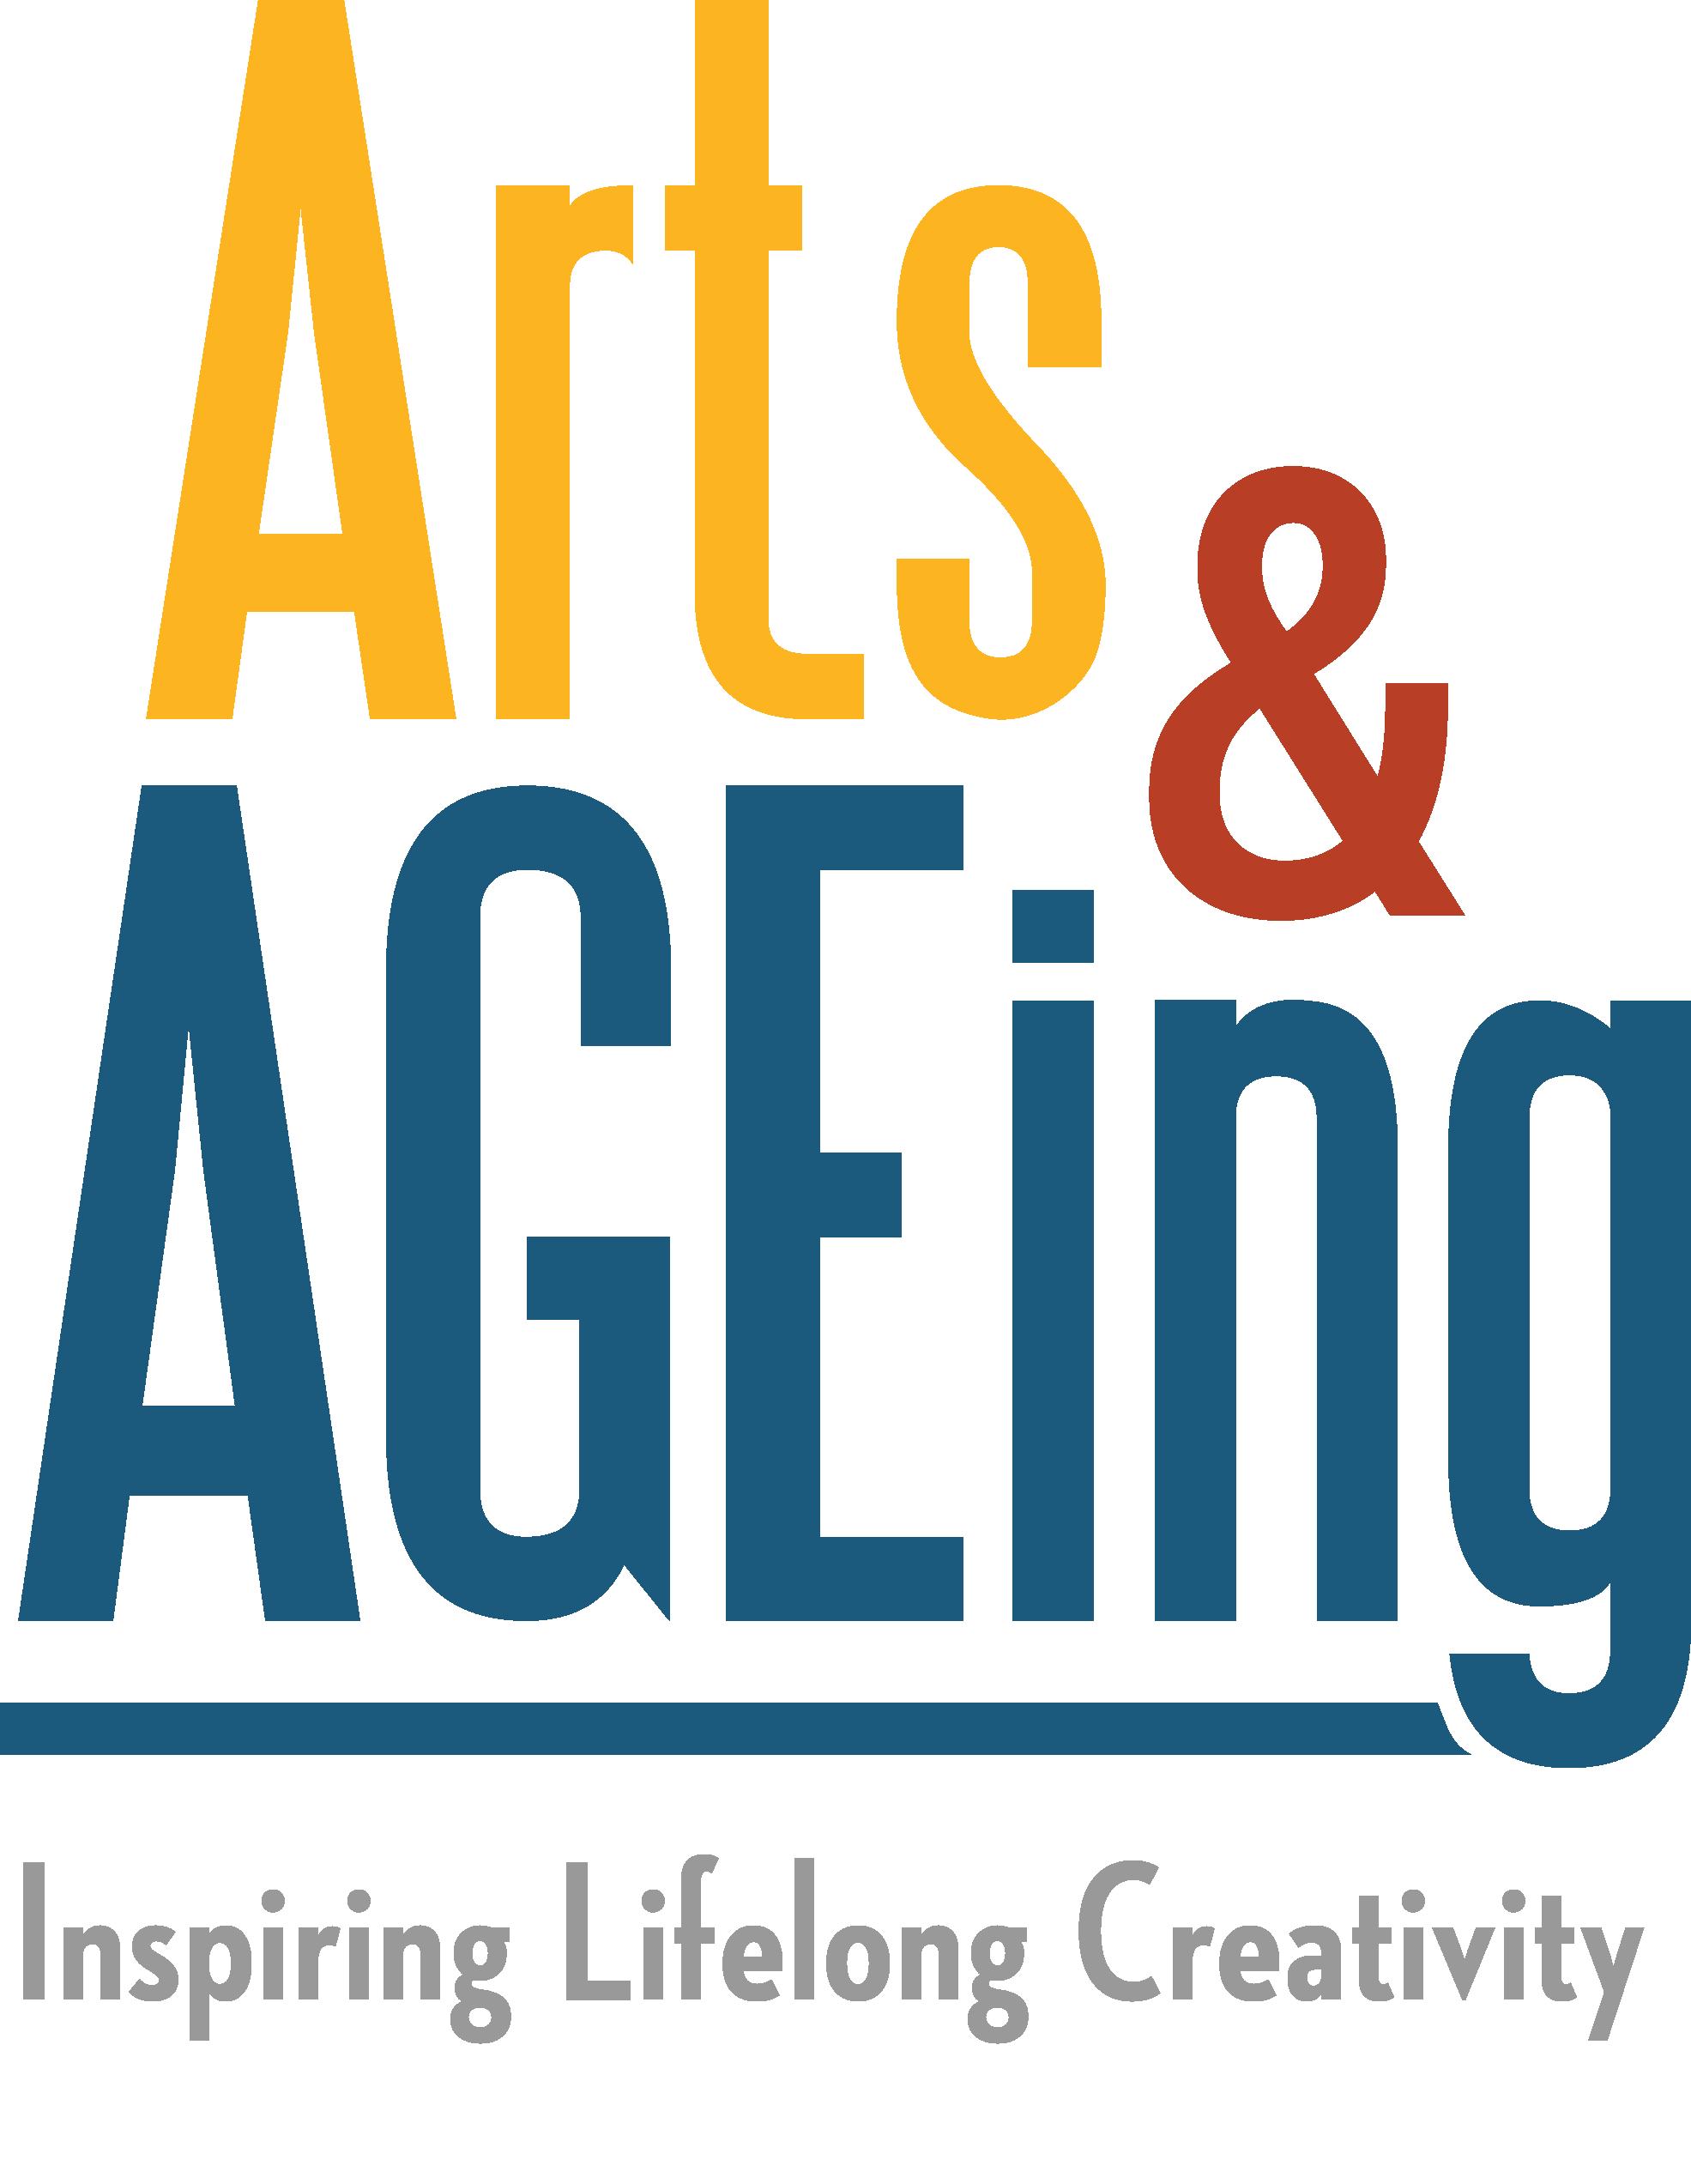 Logo + Tagline (color)